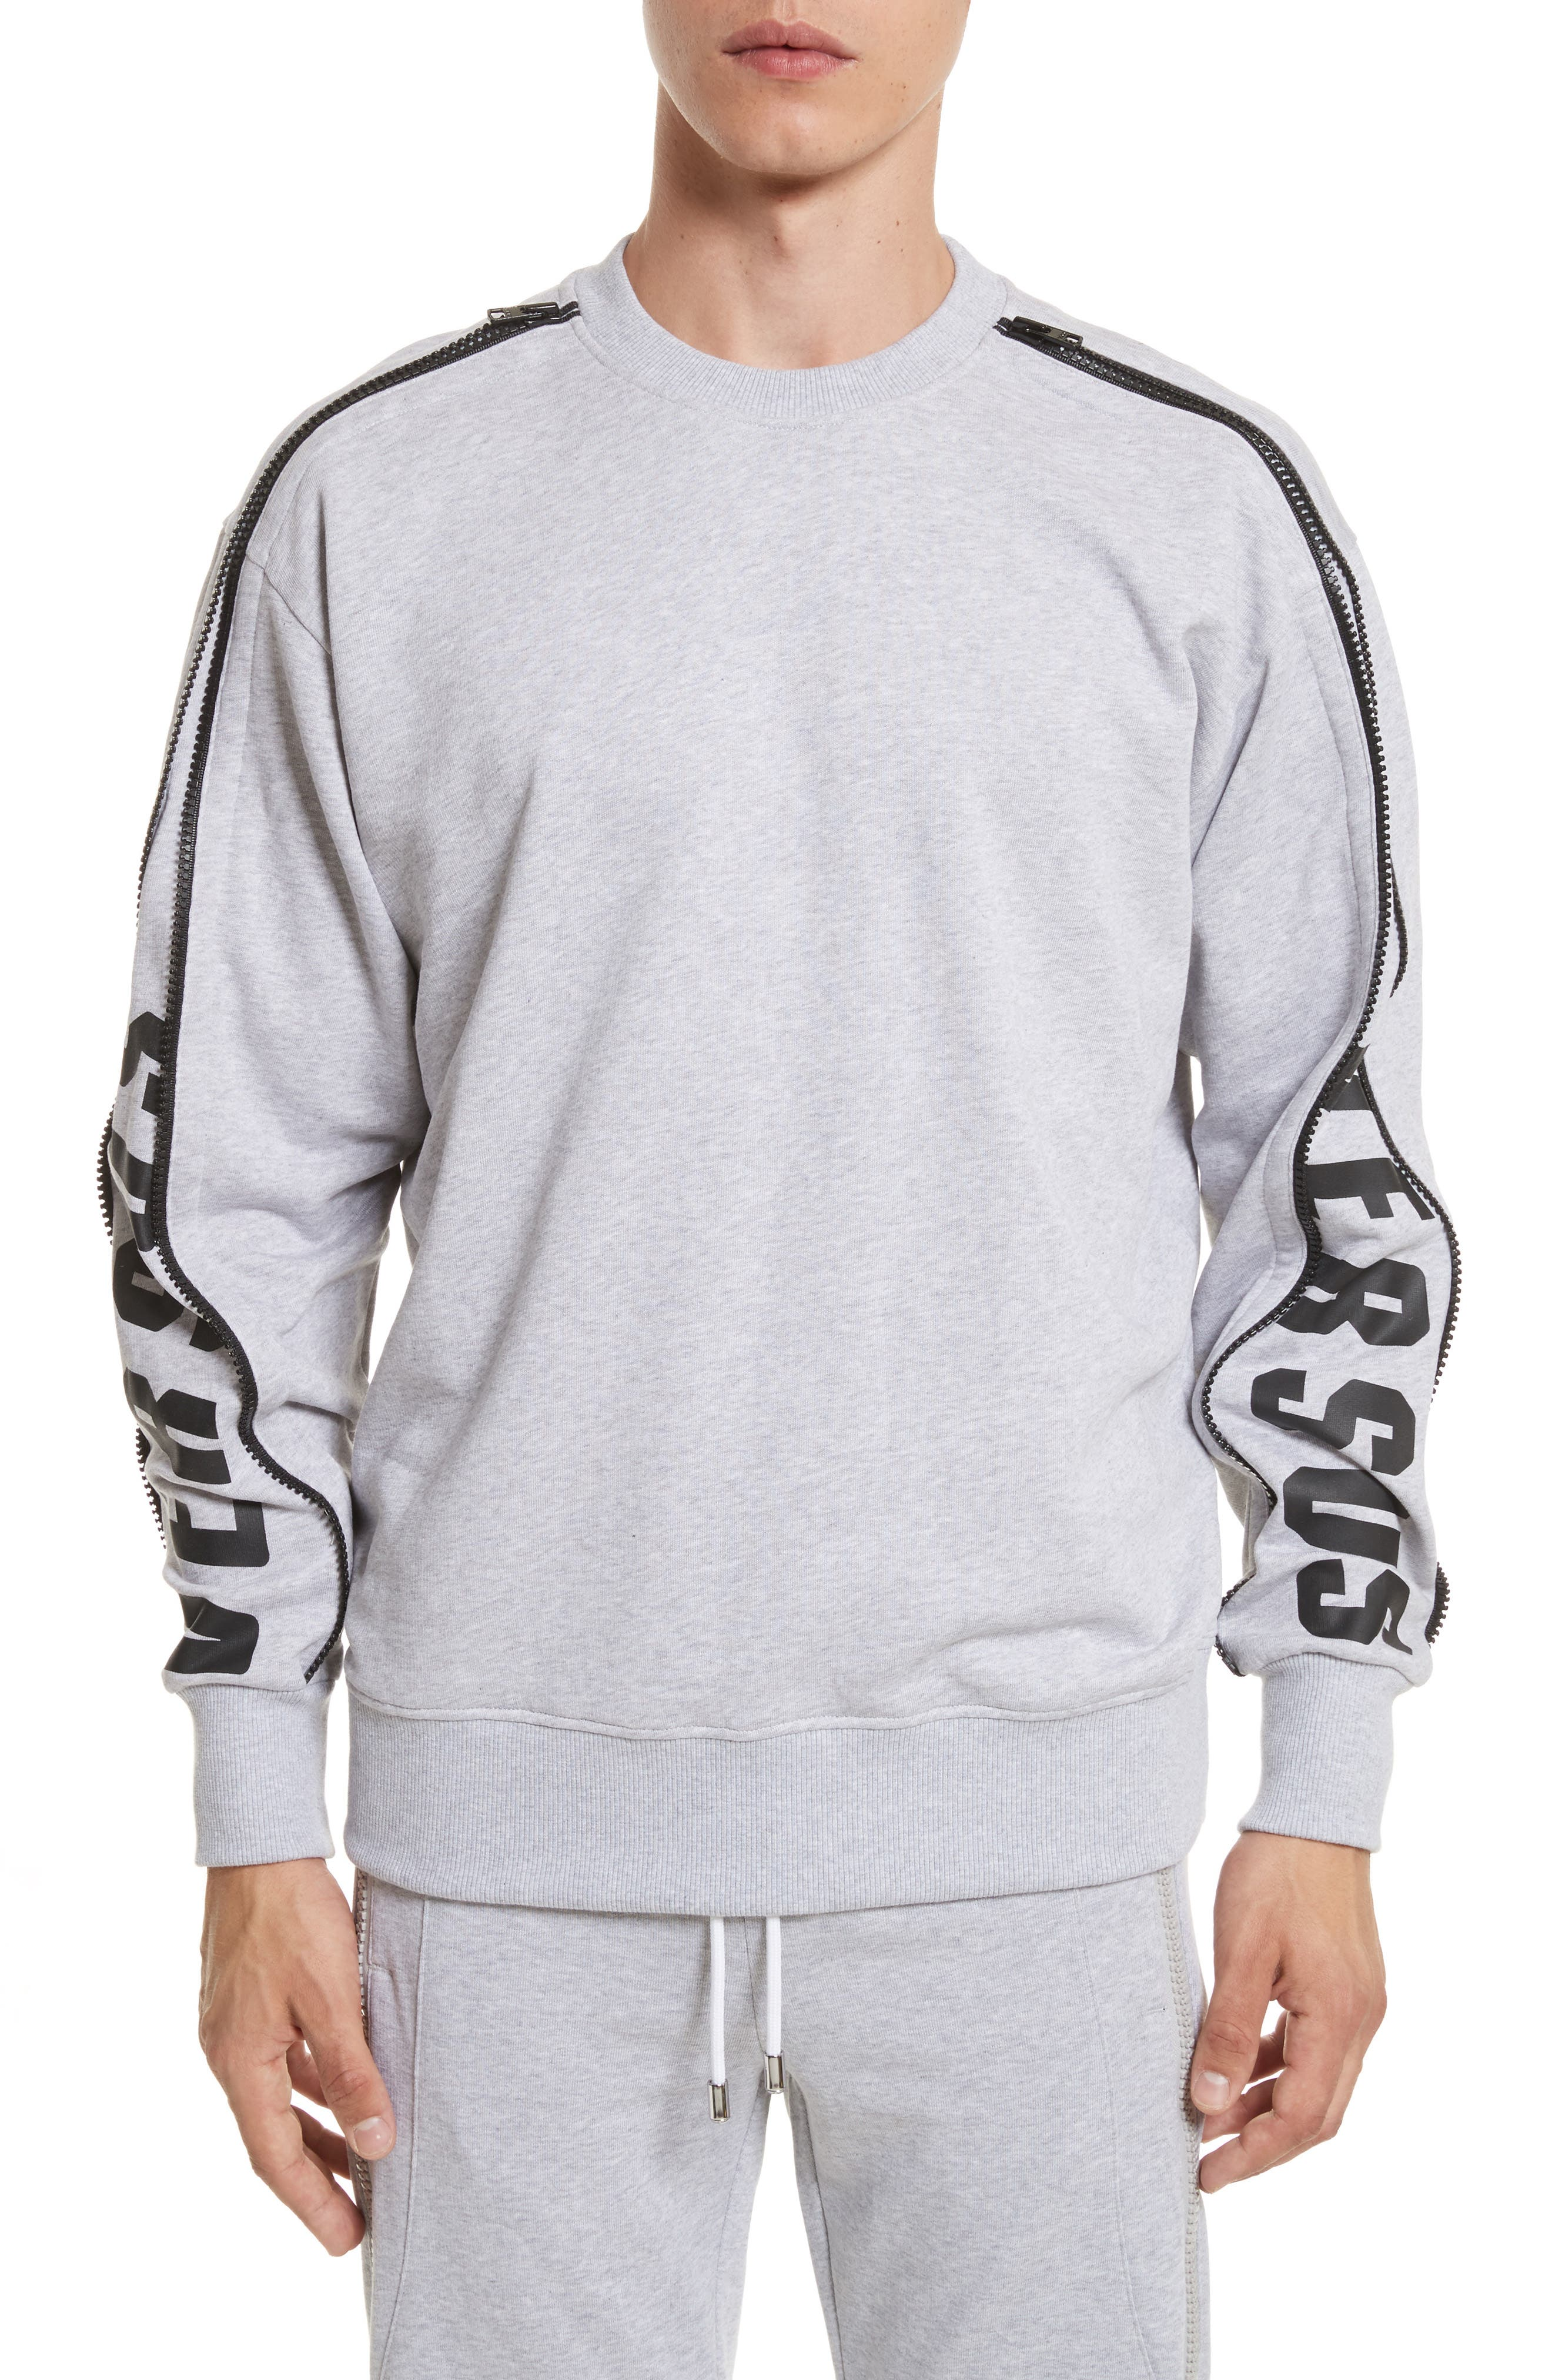 VERSUS by Versace Zip Sleeve Crewneck Sweatshirt,                             Main thumbnail 1, color,                             Grey